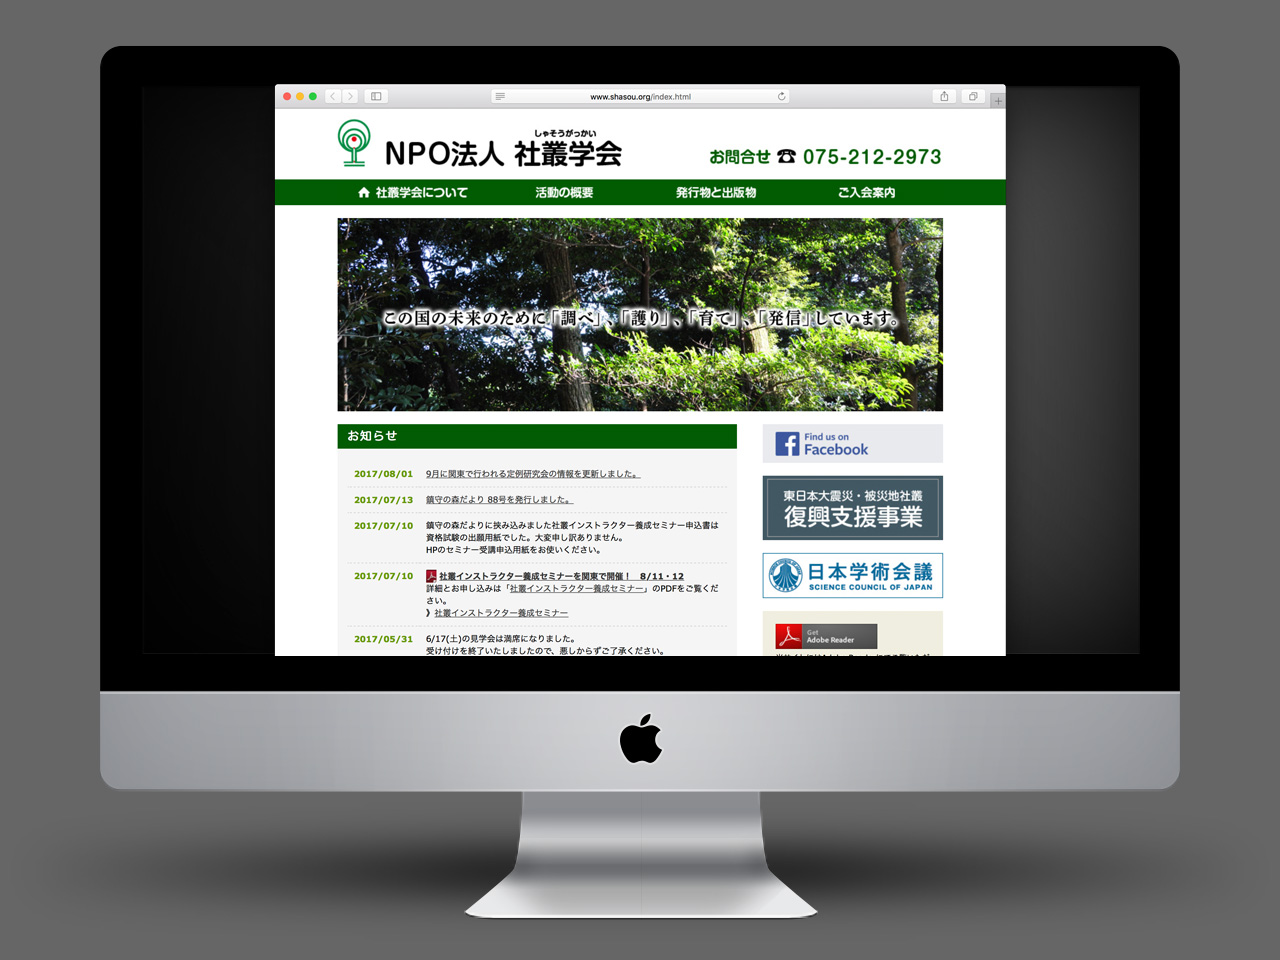 NPO法人 社叢学会 HP リニューアル